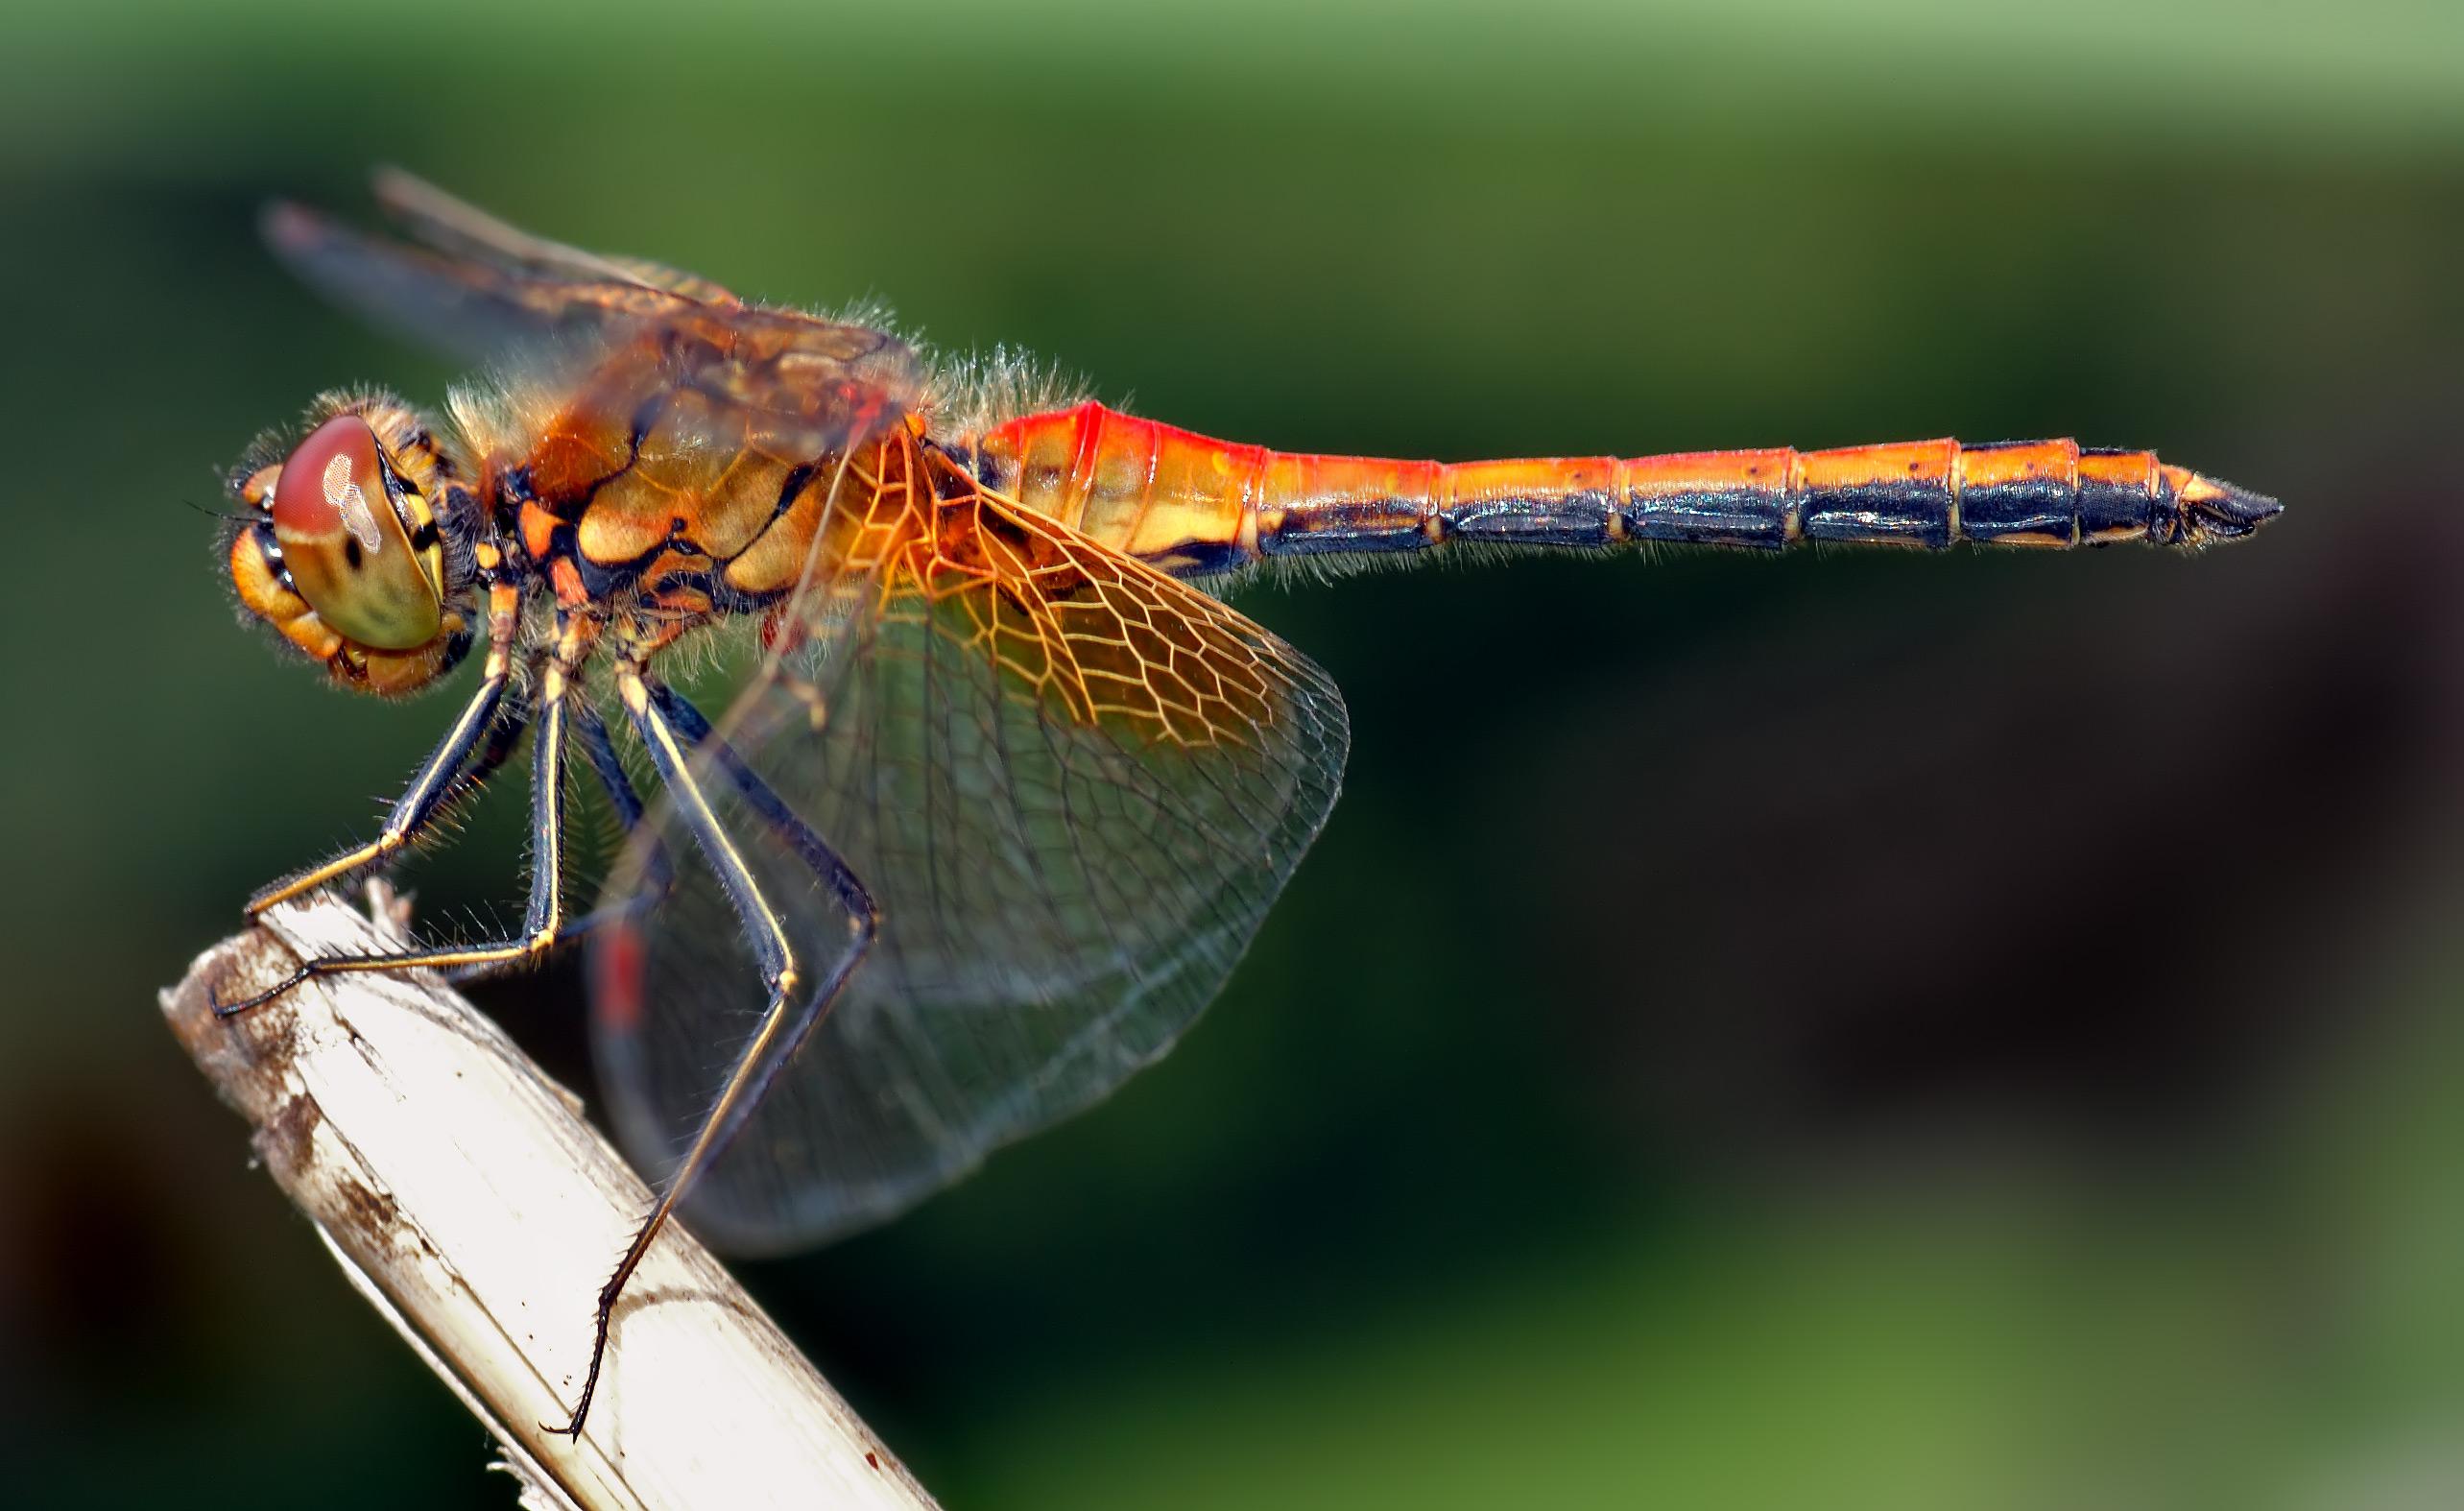 Dragonfly Wallpaper 2567x1574